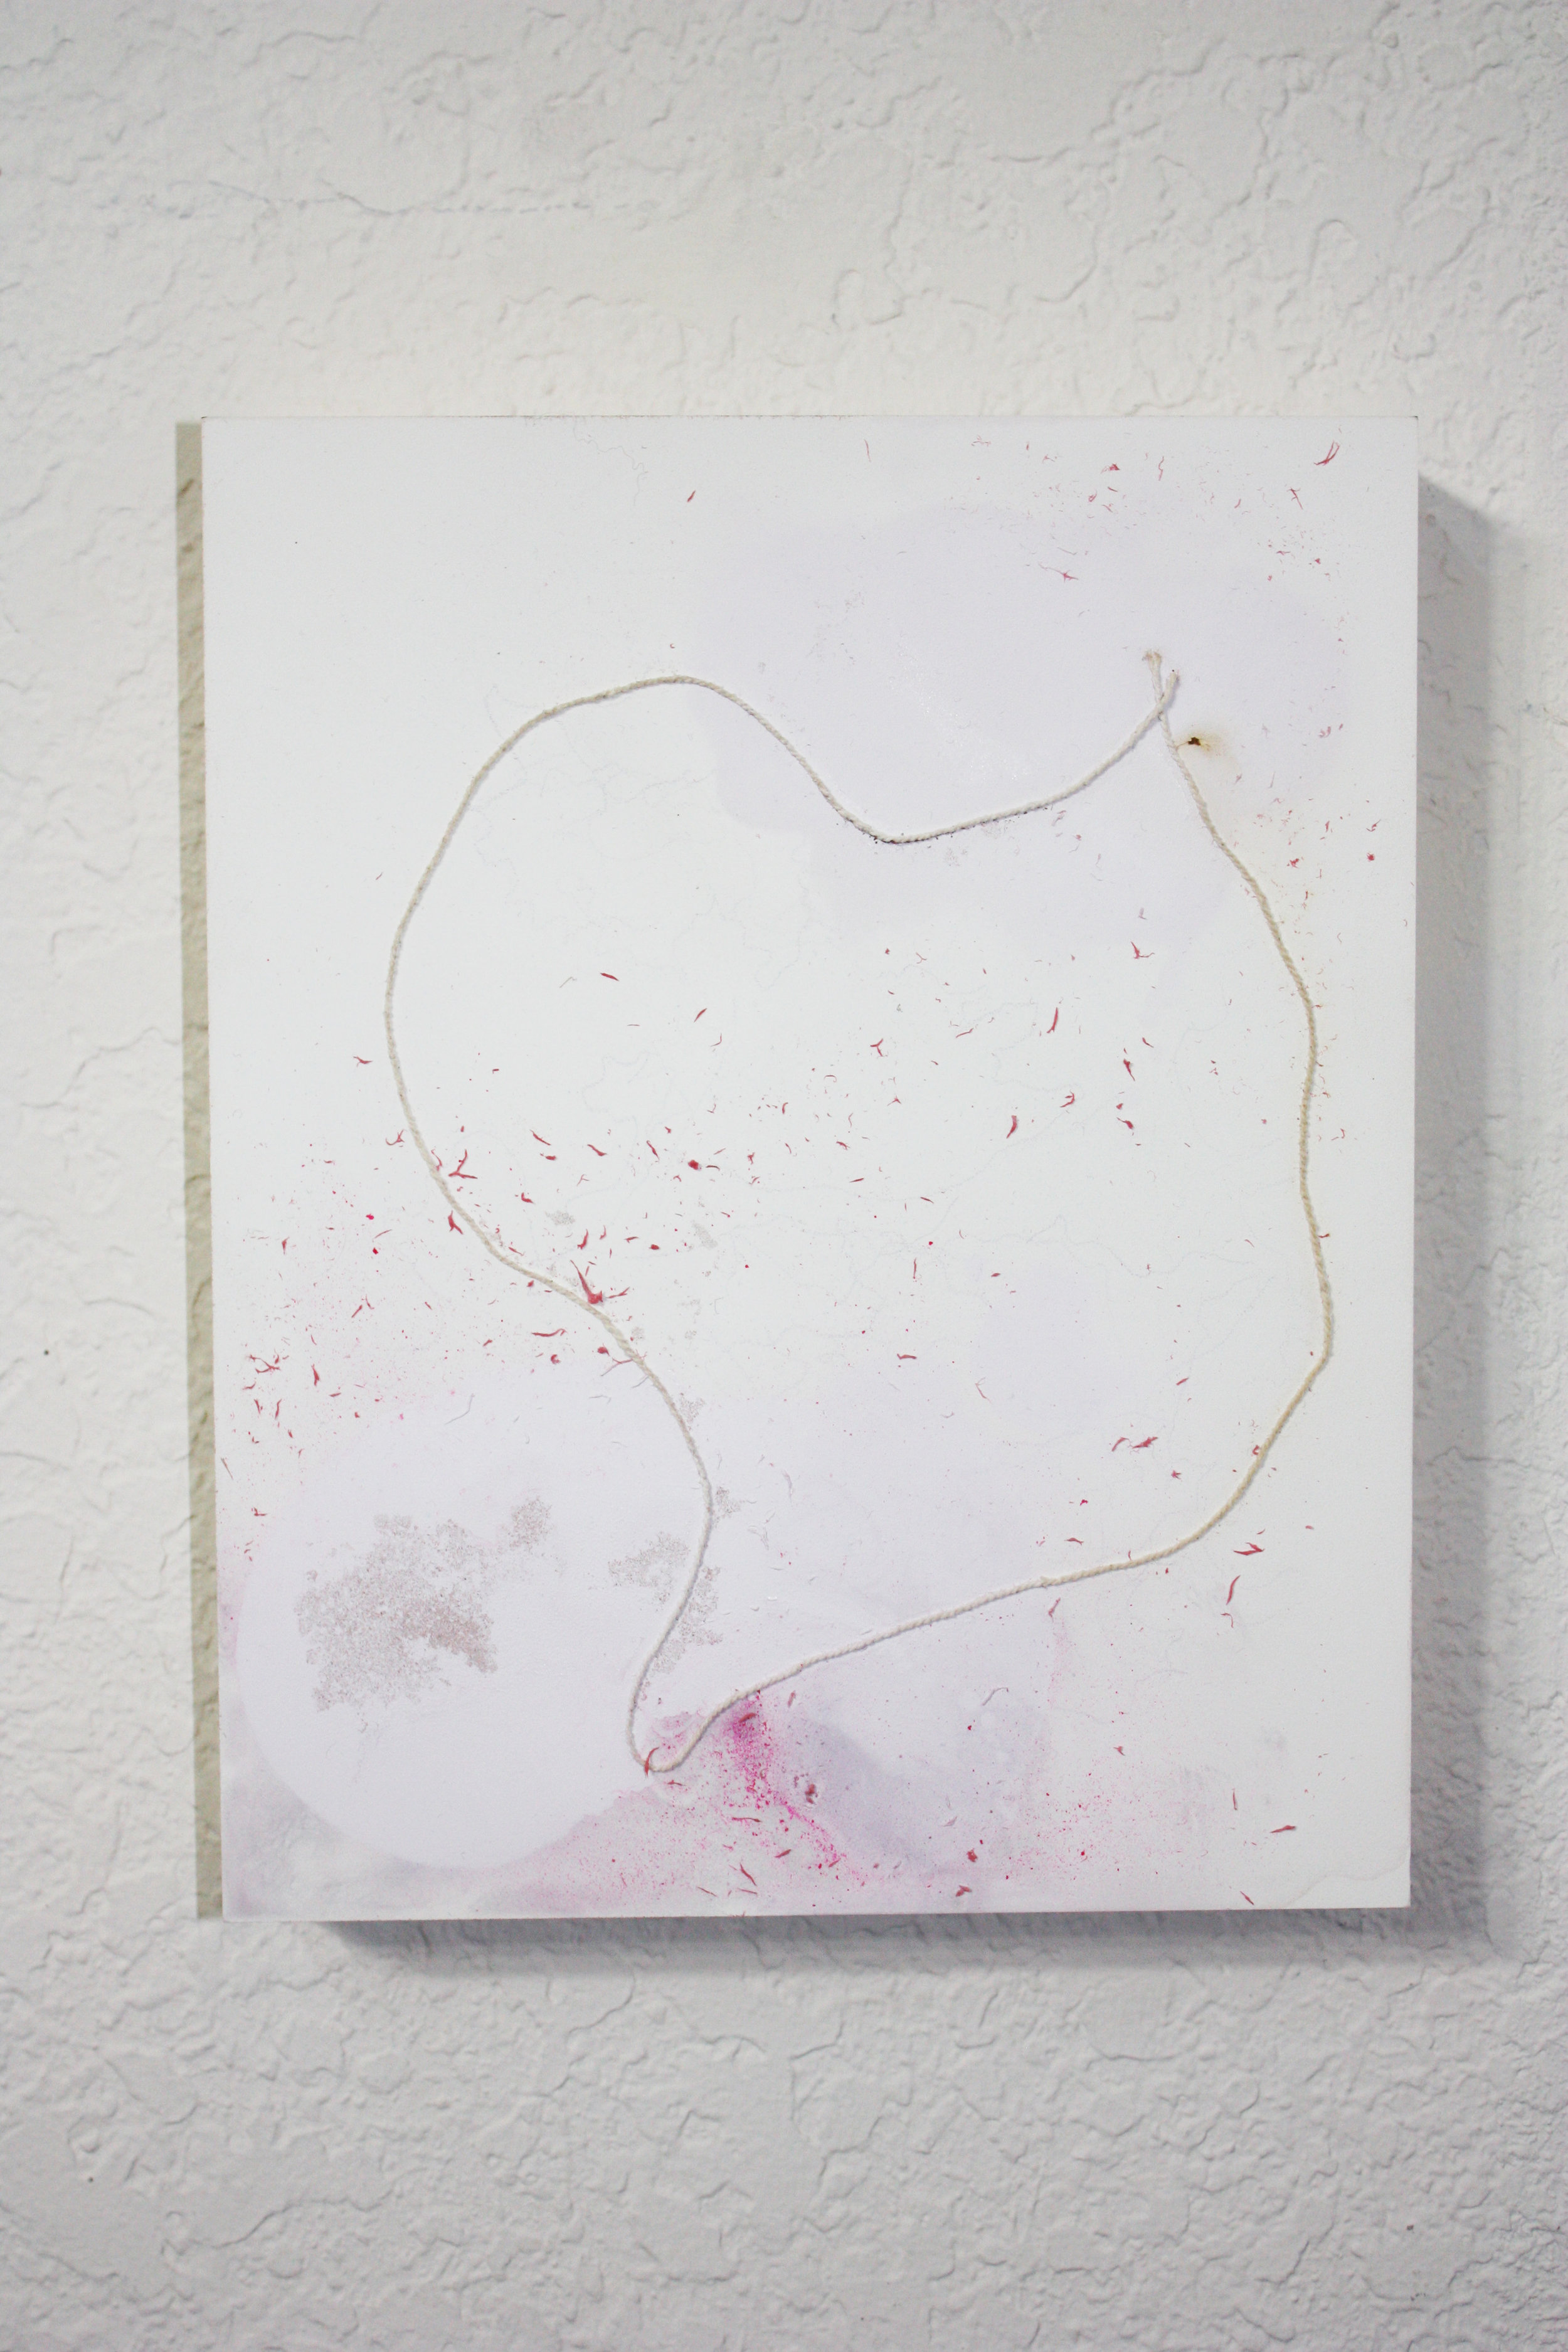 Untitled (Erased)